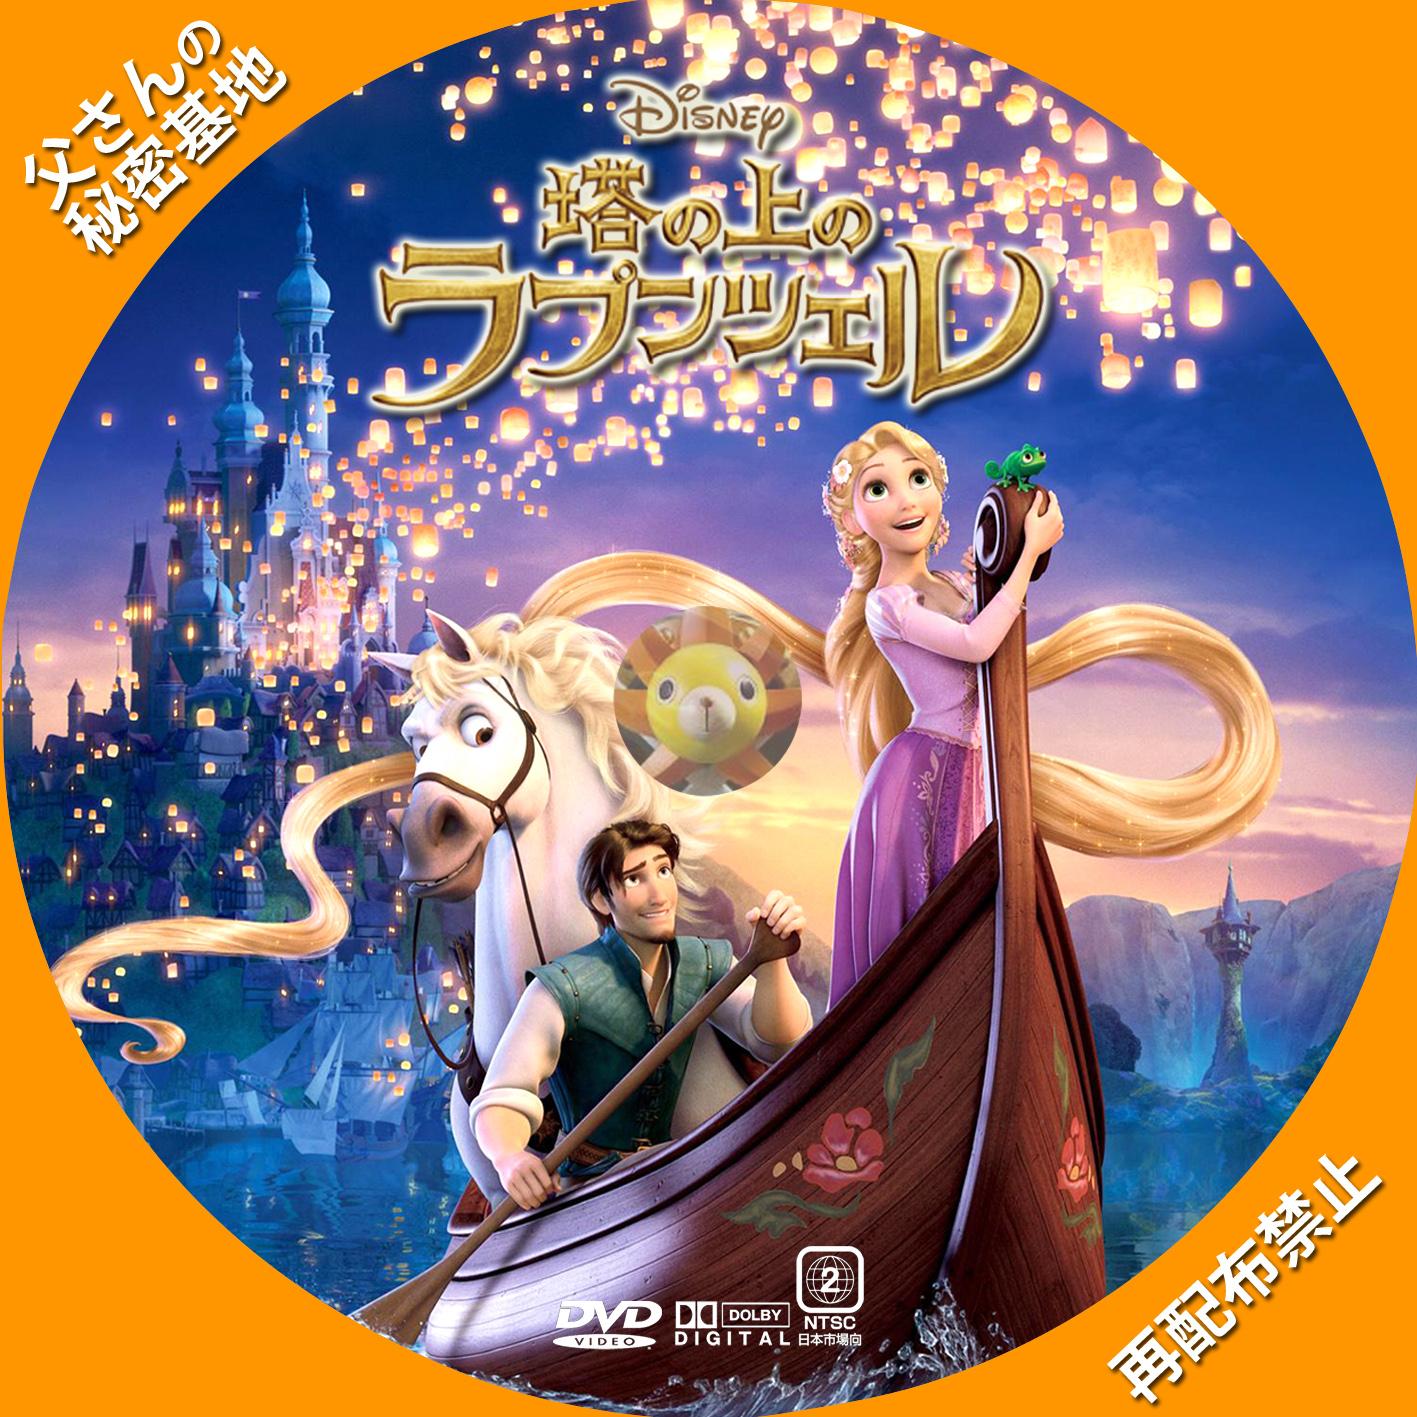 rapunzel_DVD_01.jpg